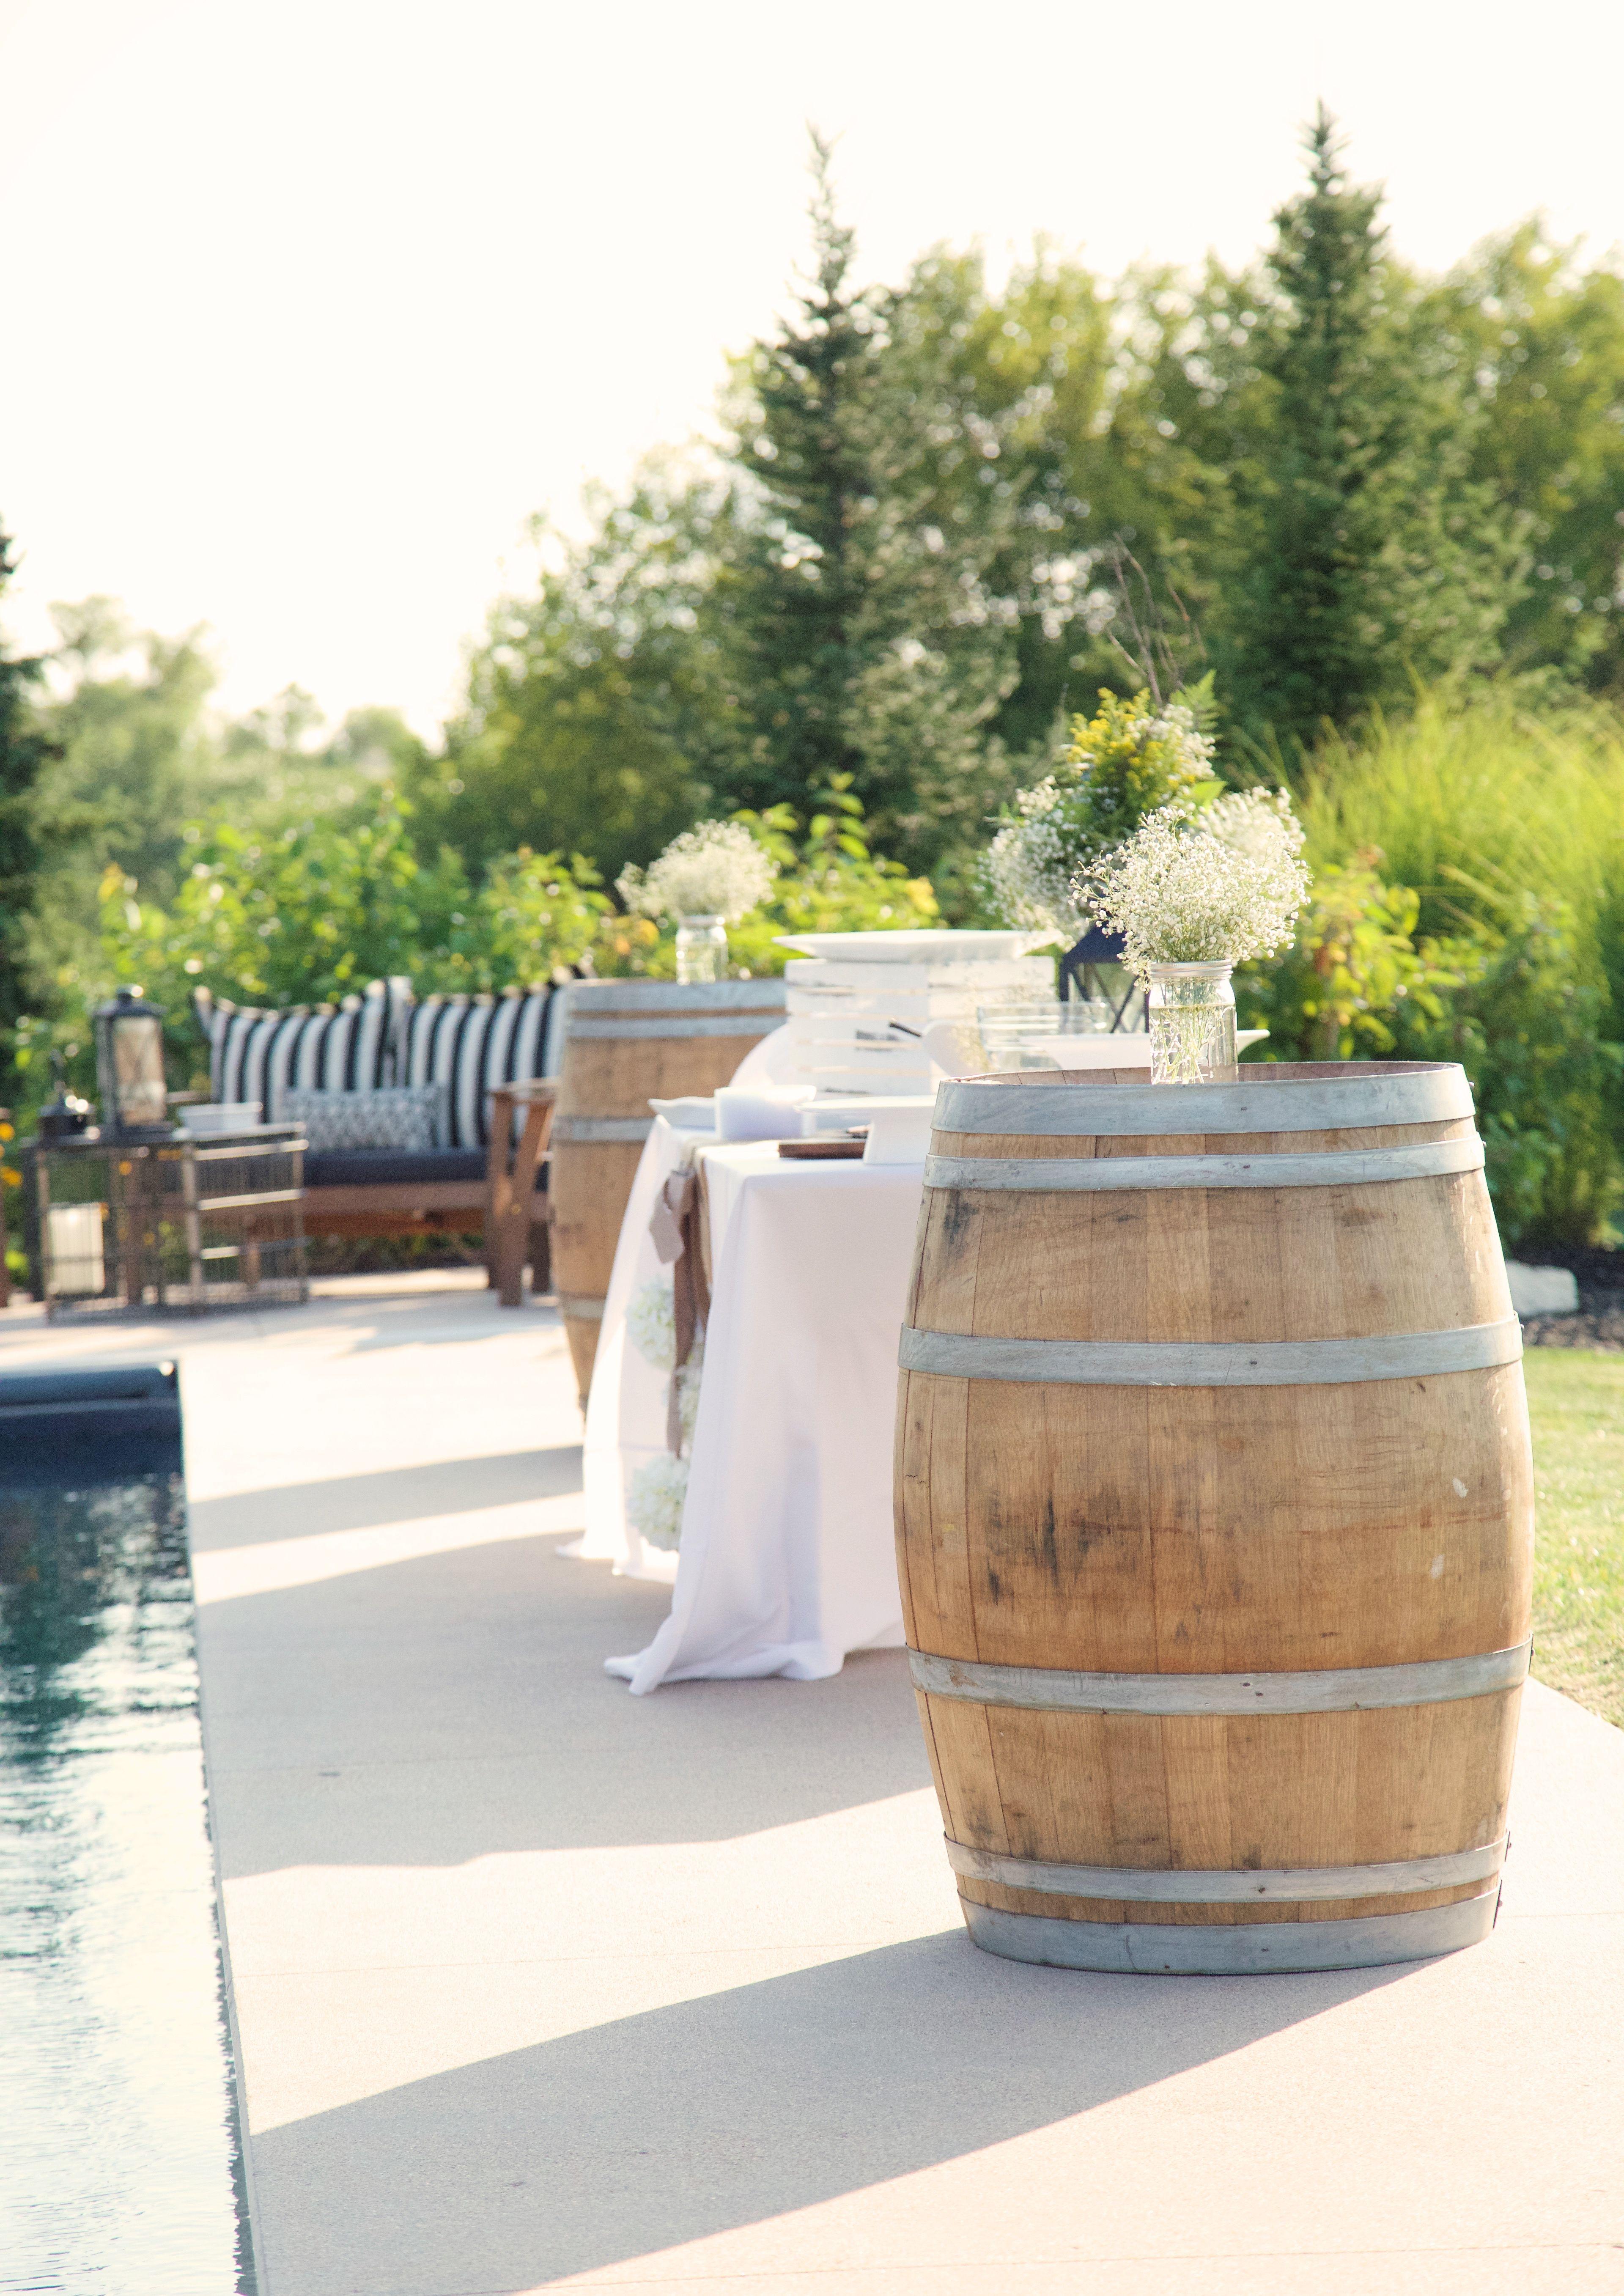 used wine barrel furniture. Appetizer Table \u0026 Wine Barrels Used As Cocktail Tables Barrel Furniture